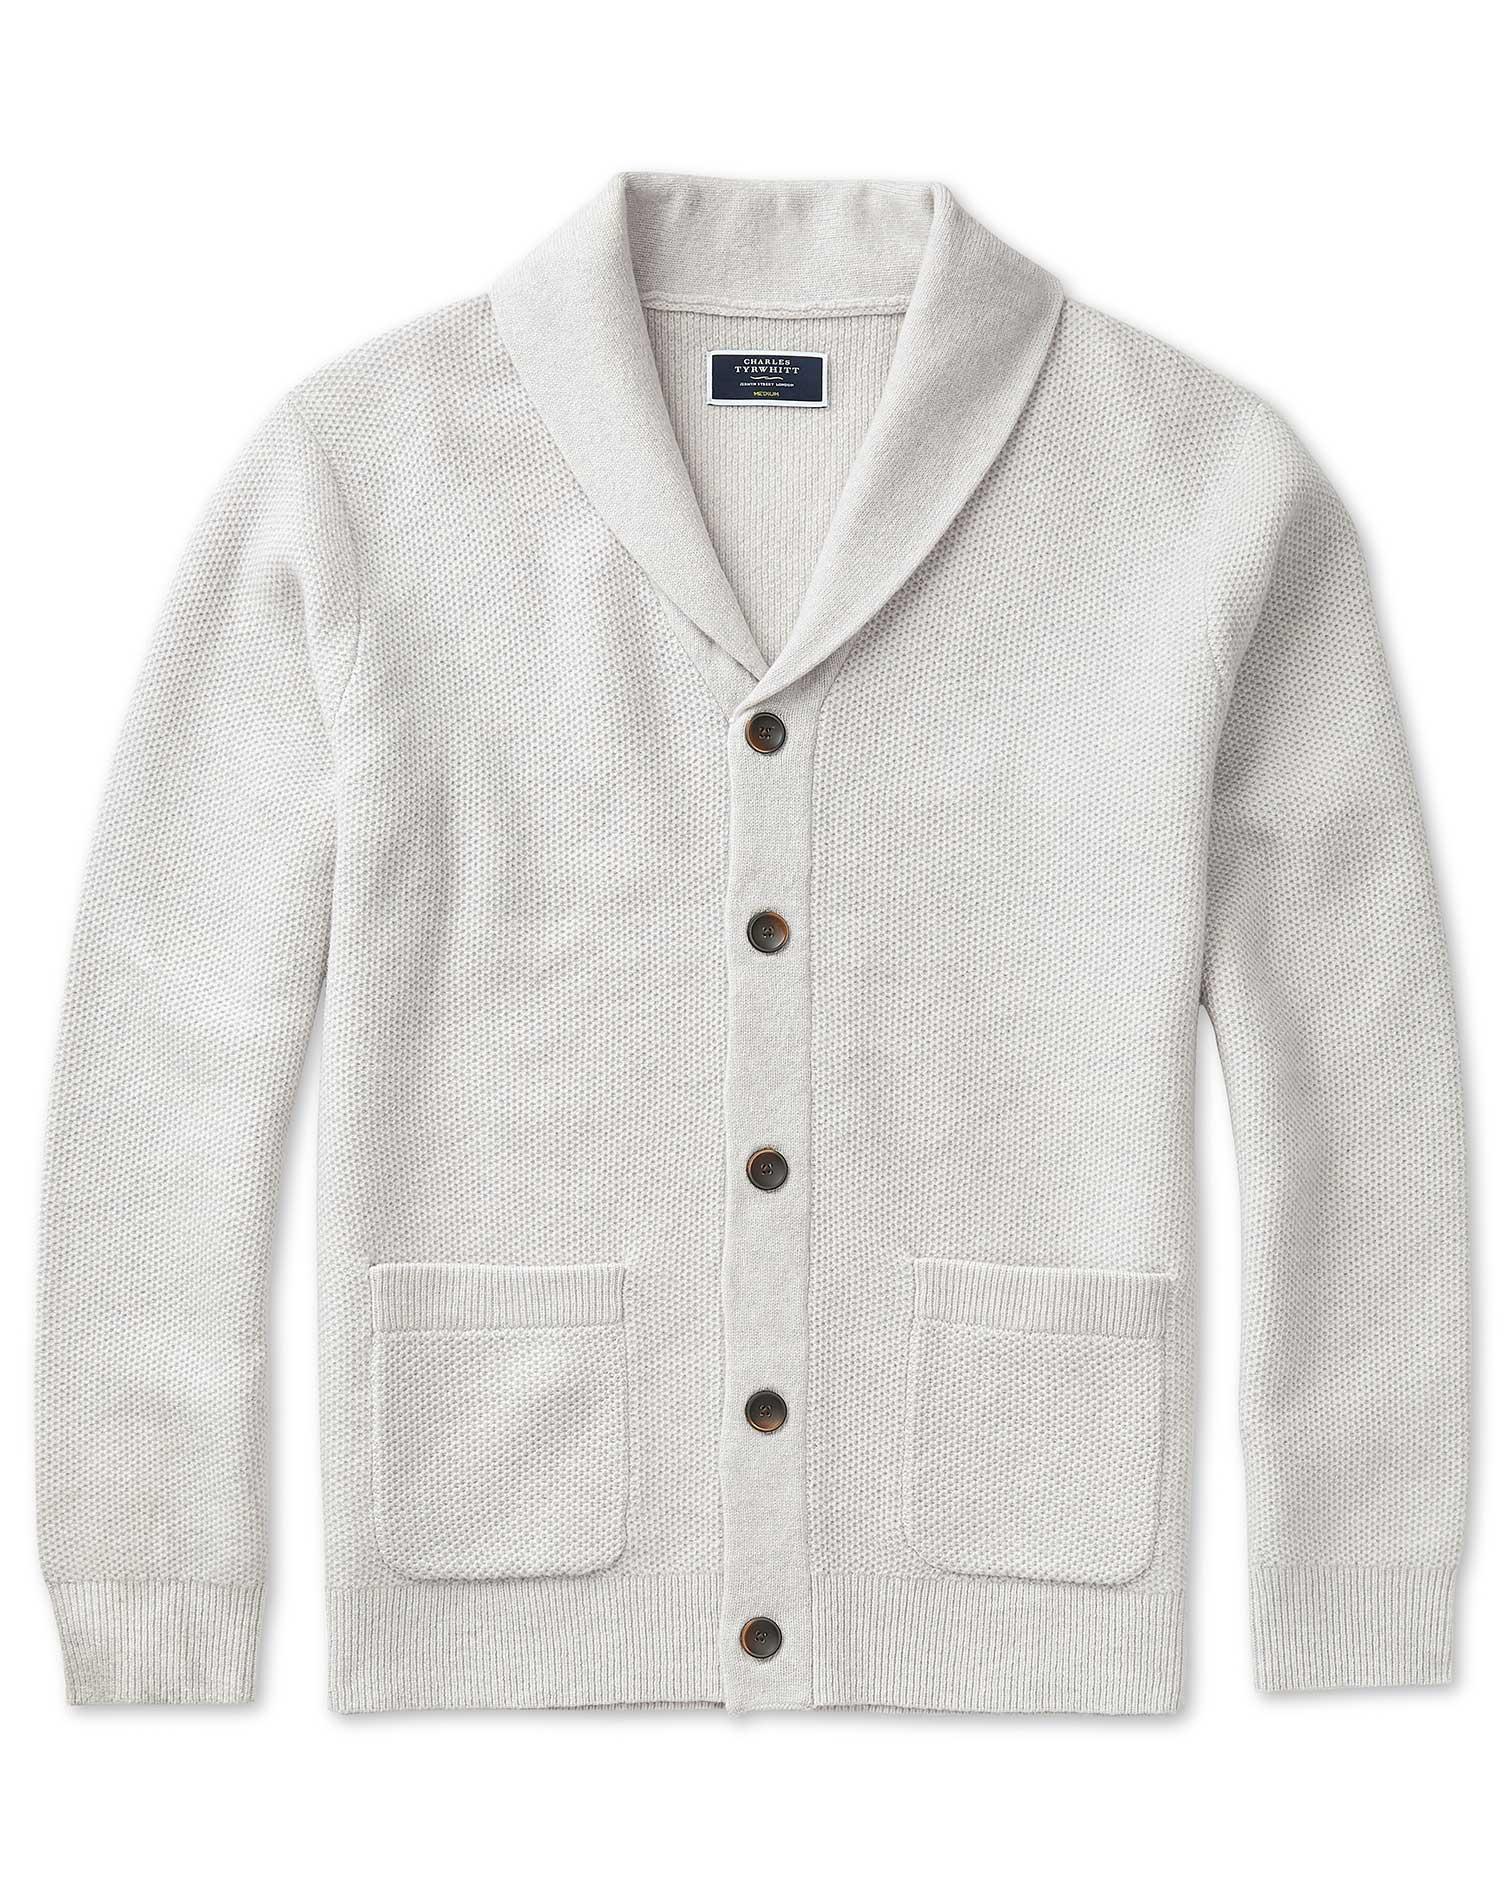 Wool Silver Grey Textured Merino Shawl Neck Cardigan